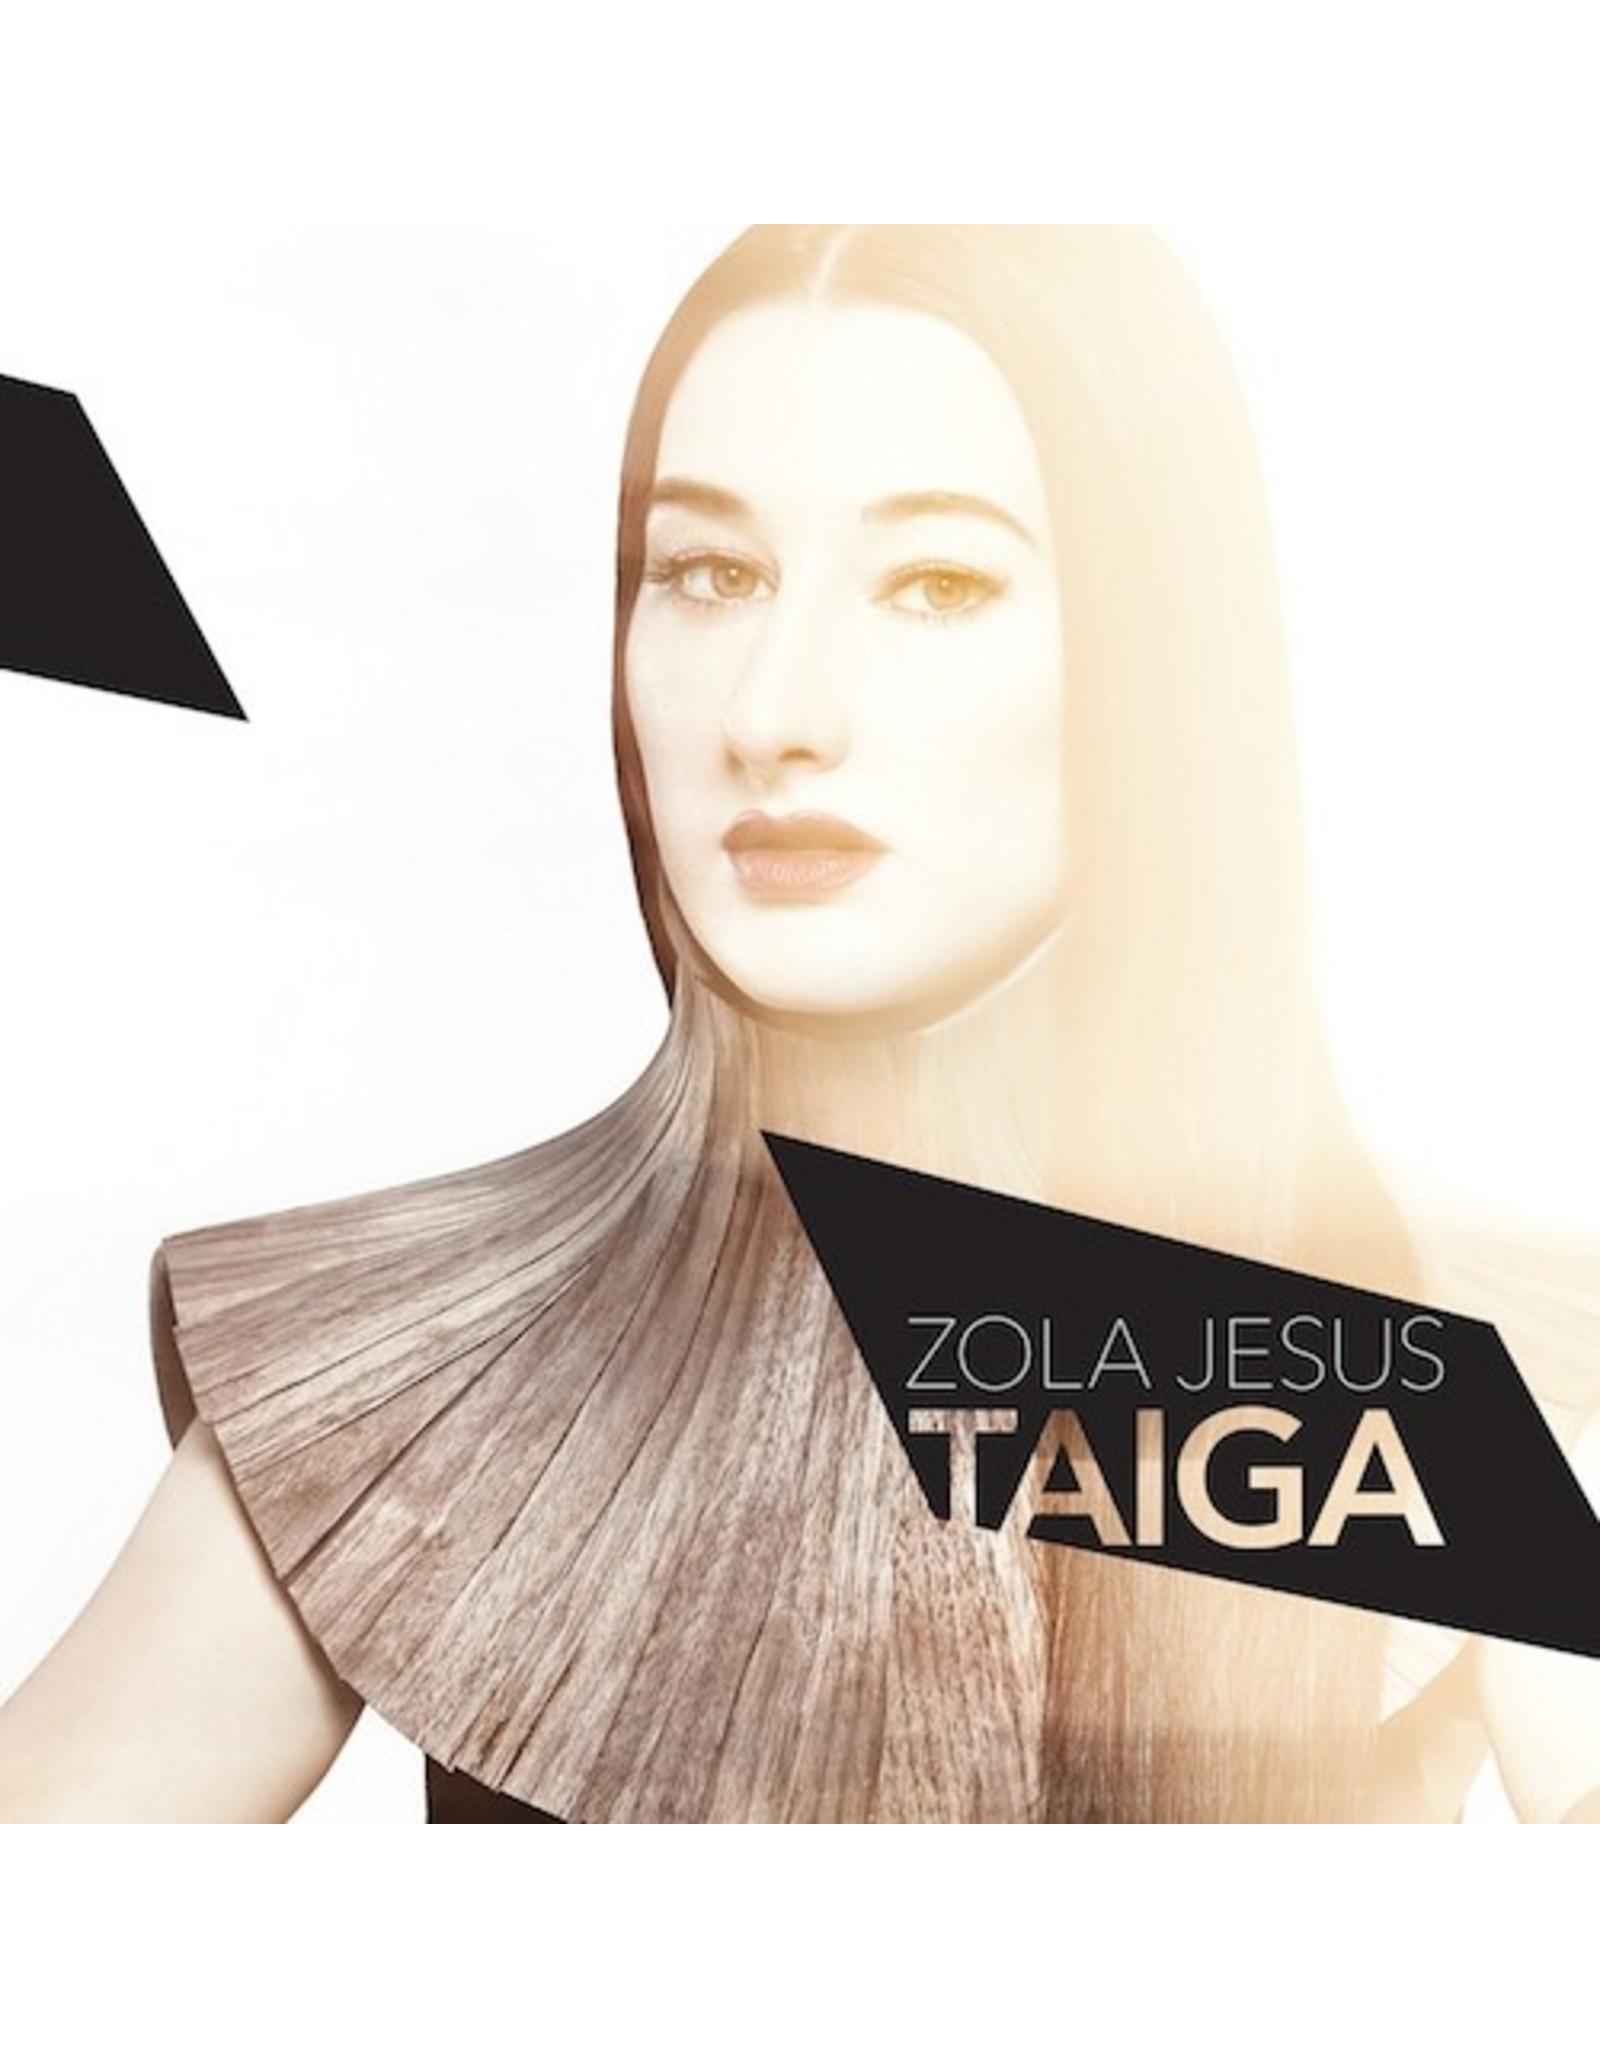 New Vinyl Zola Jesus - Taiga LP